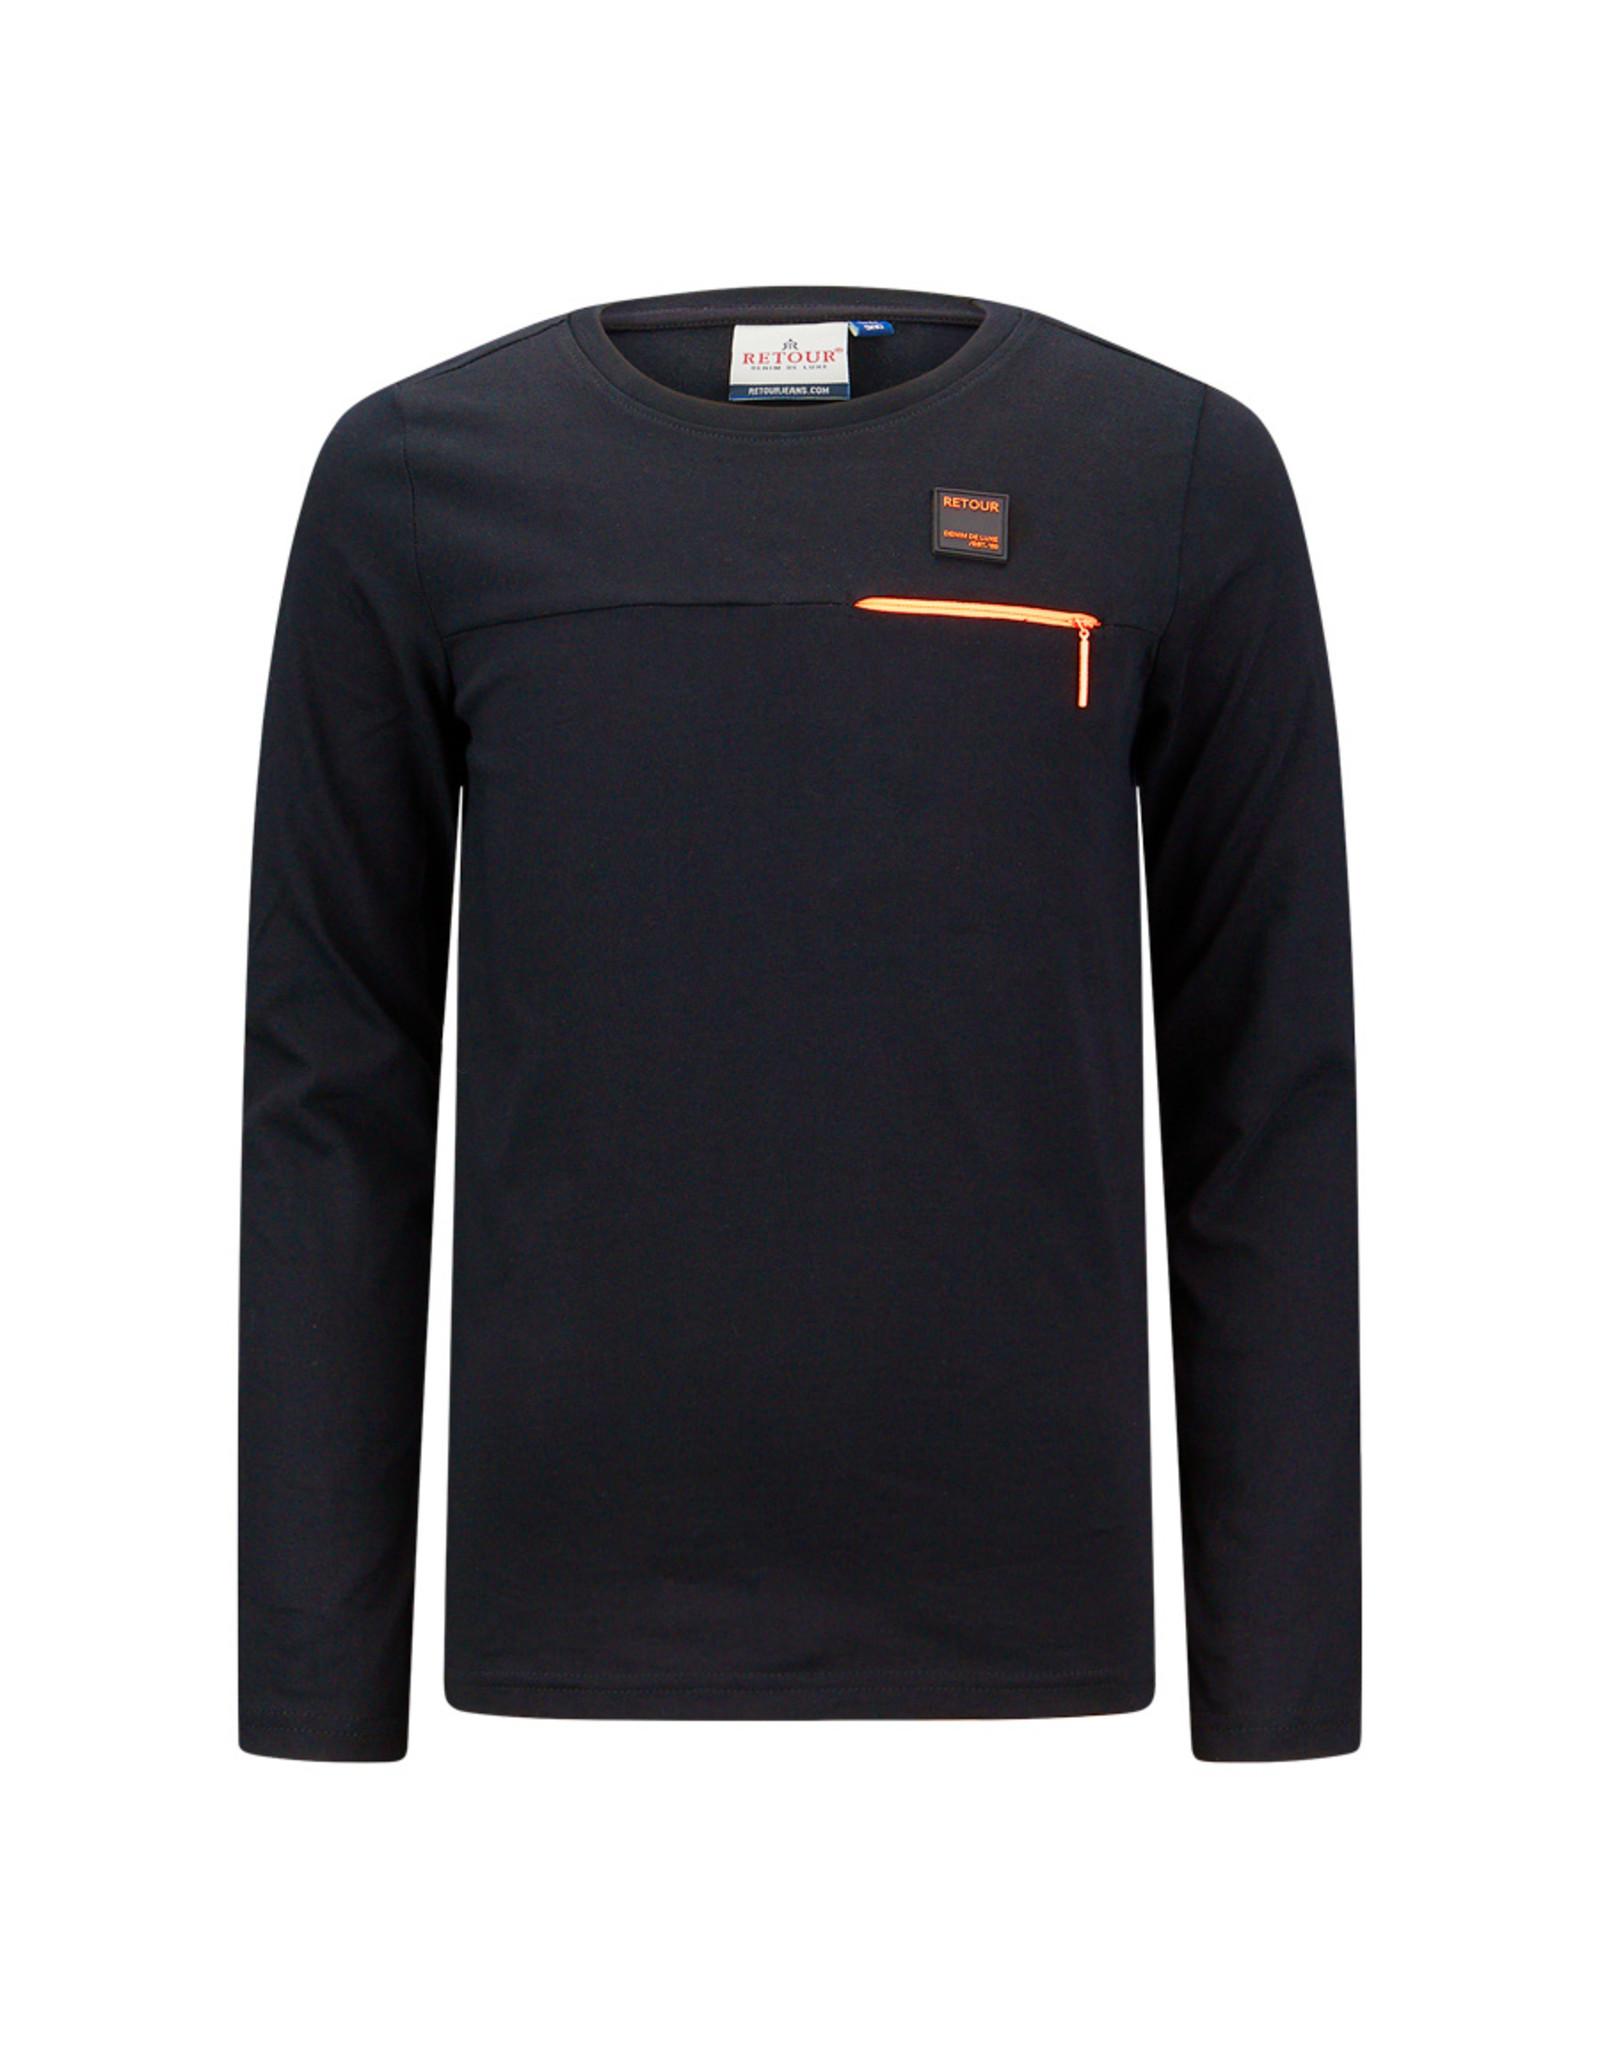 Retour Matz  T-Shirt